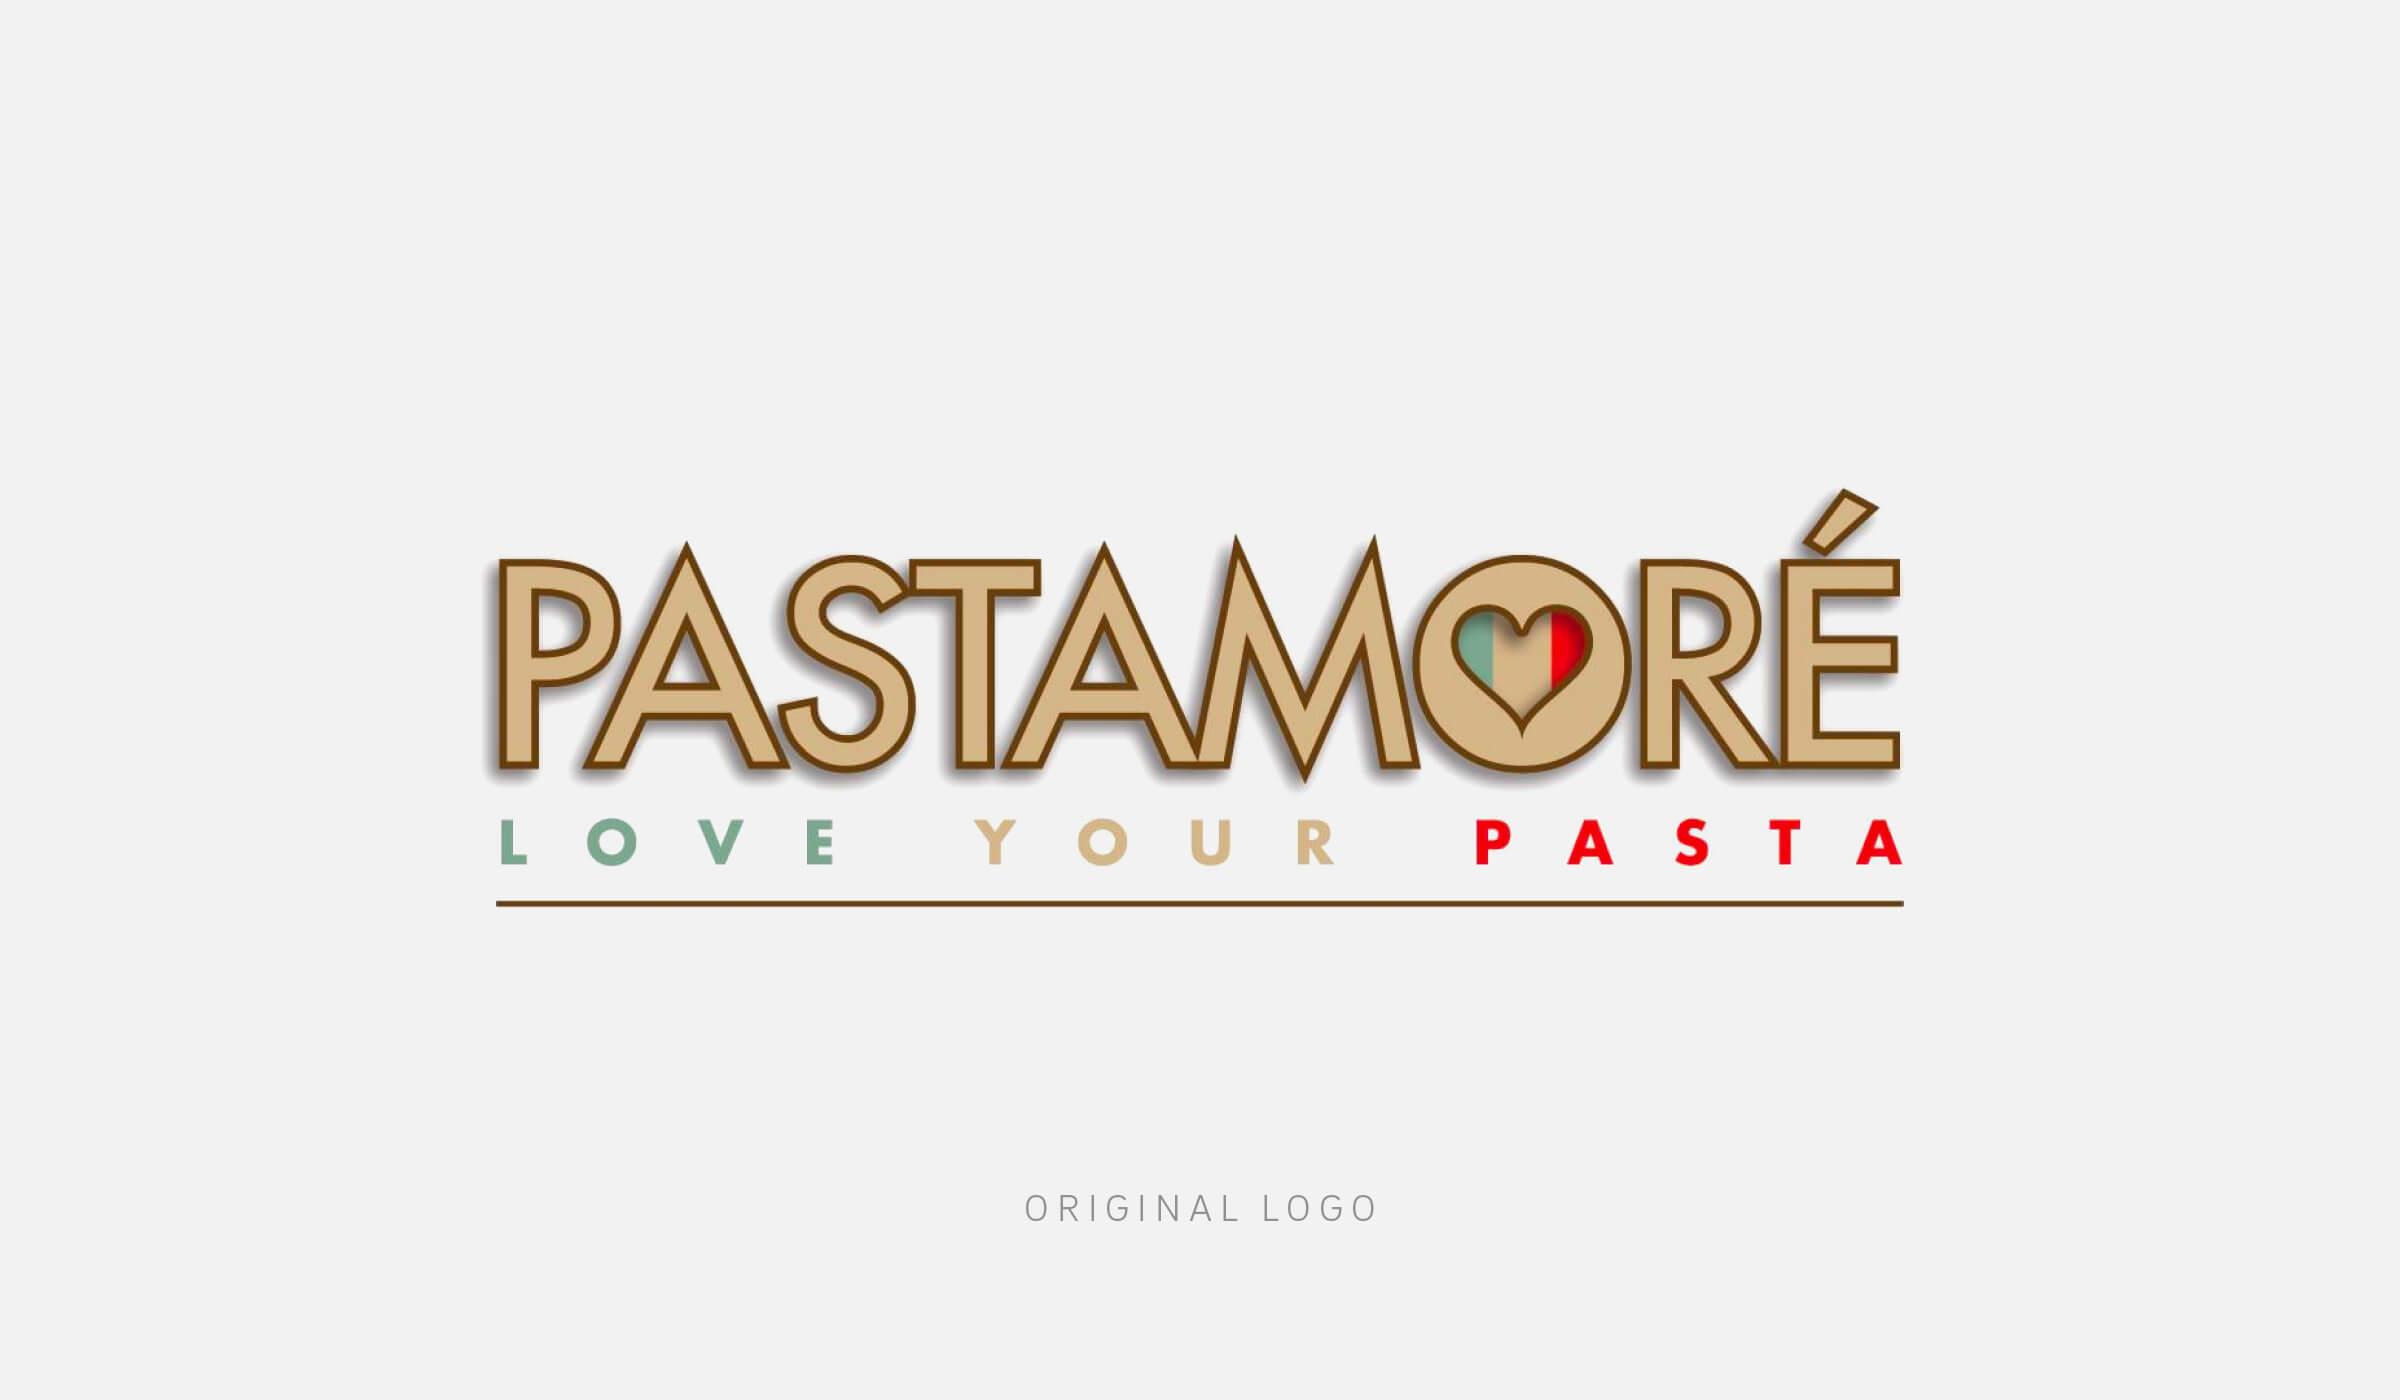 Pastamore old logo